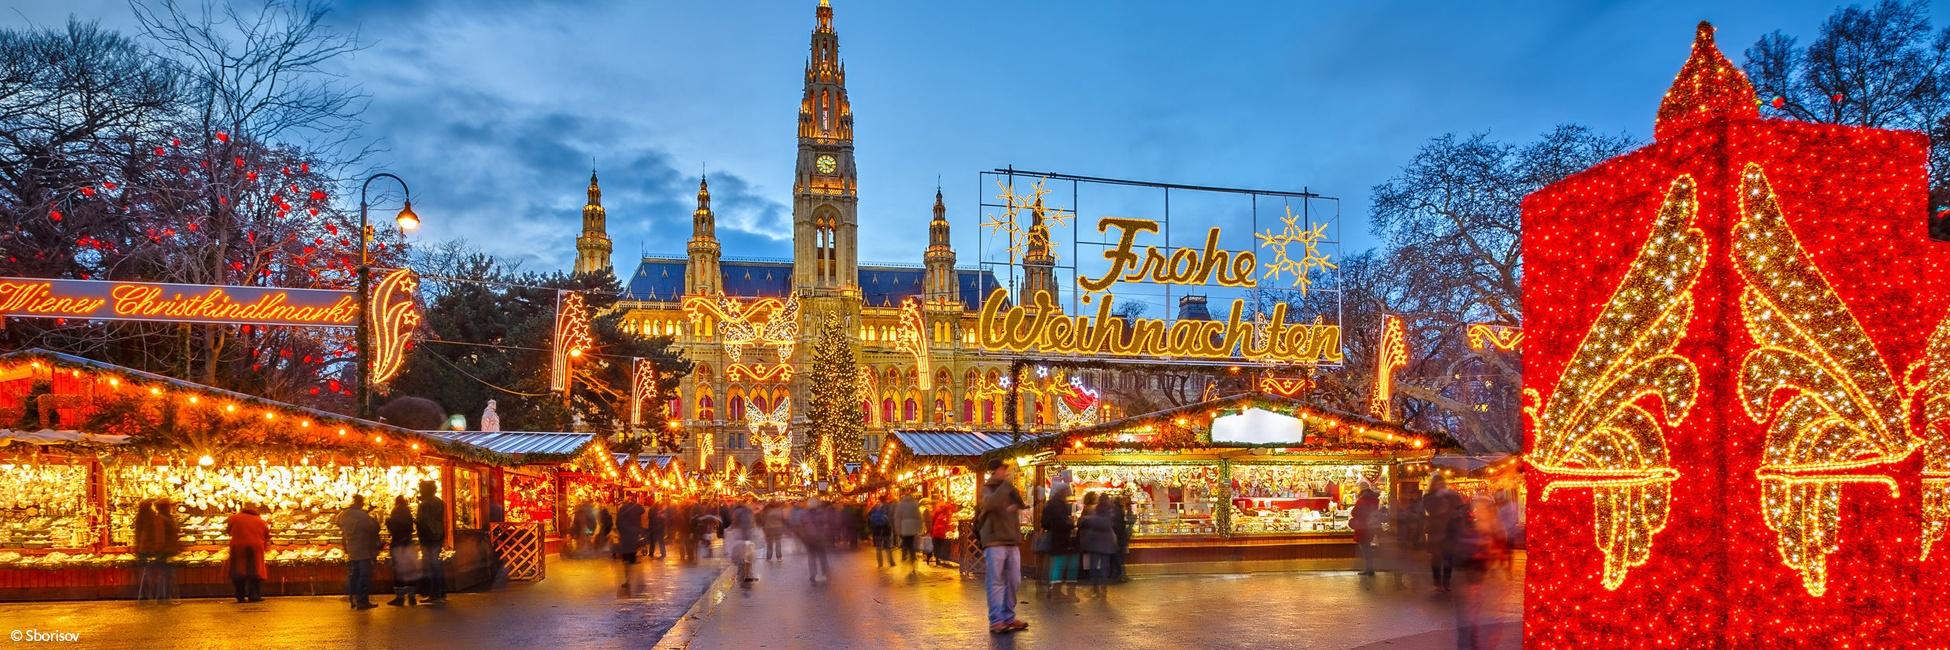 Croisieurope cruises to Vienna in Winter